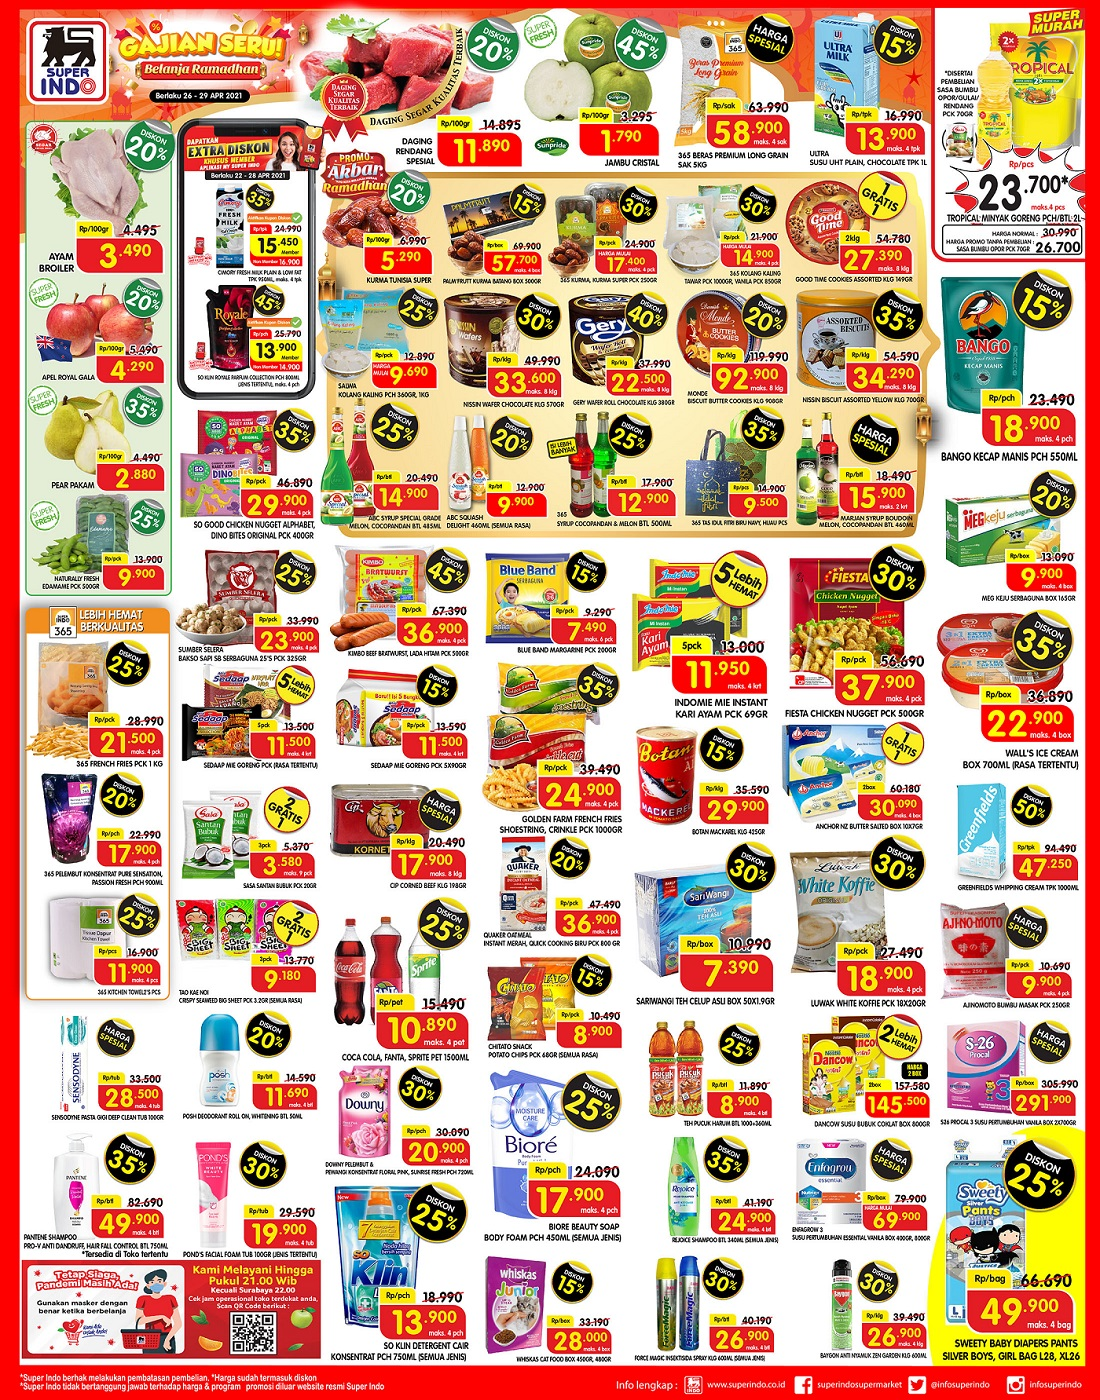 Katalog Promo Superindo 26-29 April 2021.